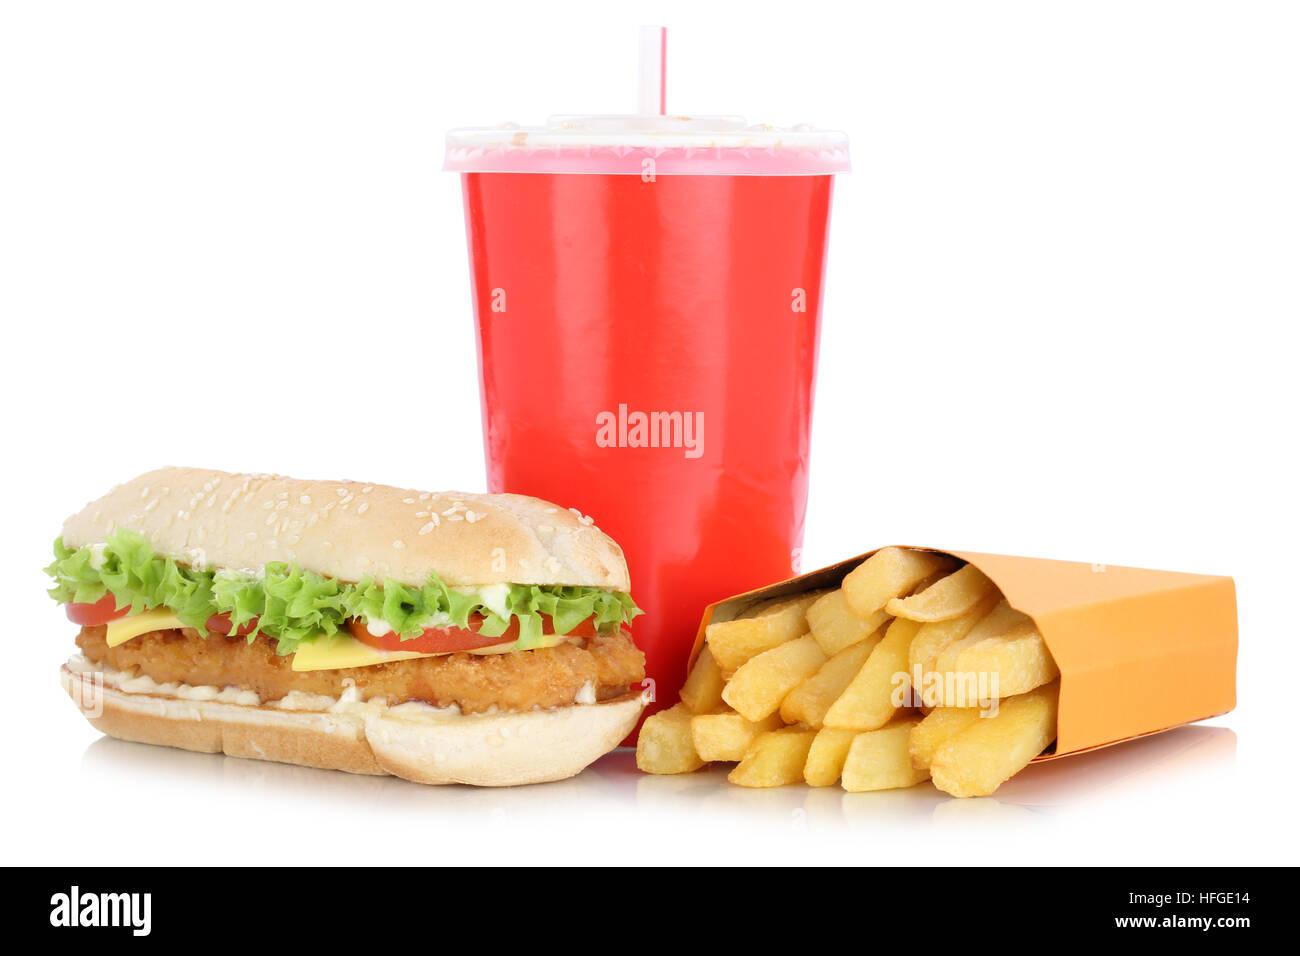 Hamburguesa de pollo Chickenburger hamburguesa y patatas fritas comidas de menú combo beber aislado sobre un Imagen De Stock